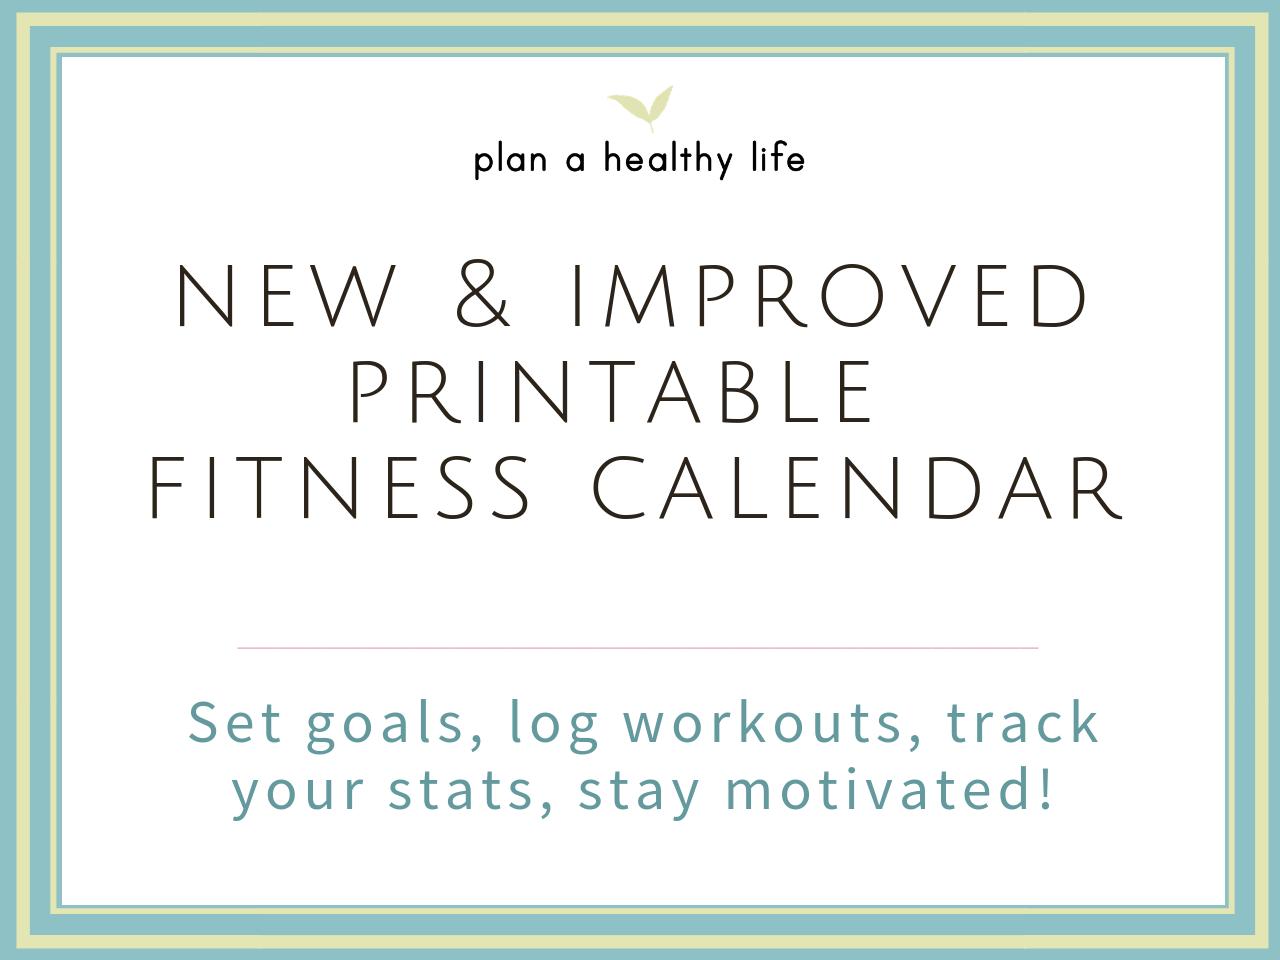 new-fitness-calendar-blog-post-featured.png